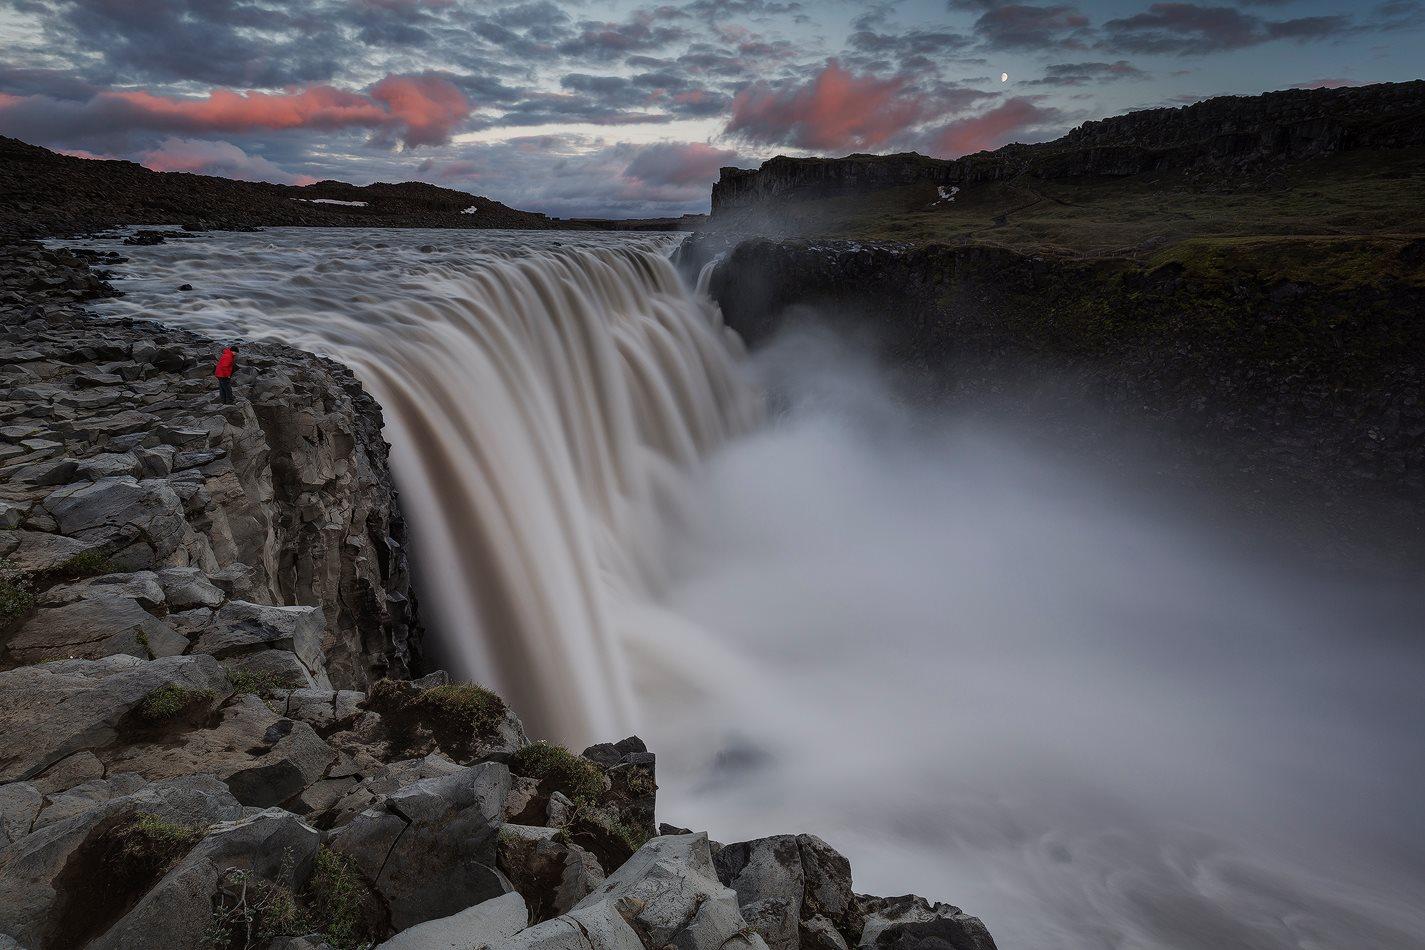 La cascada más poderosa de Europa, Dettifoss, choca contra el cañón Jökulsárgljúfur con un rugido aterrador.